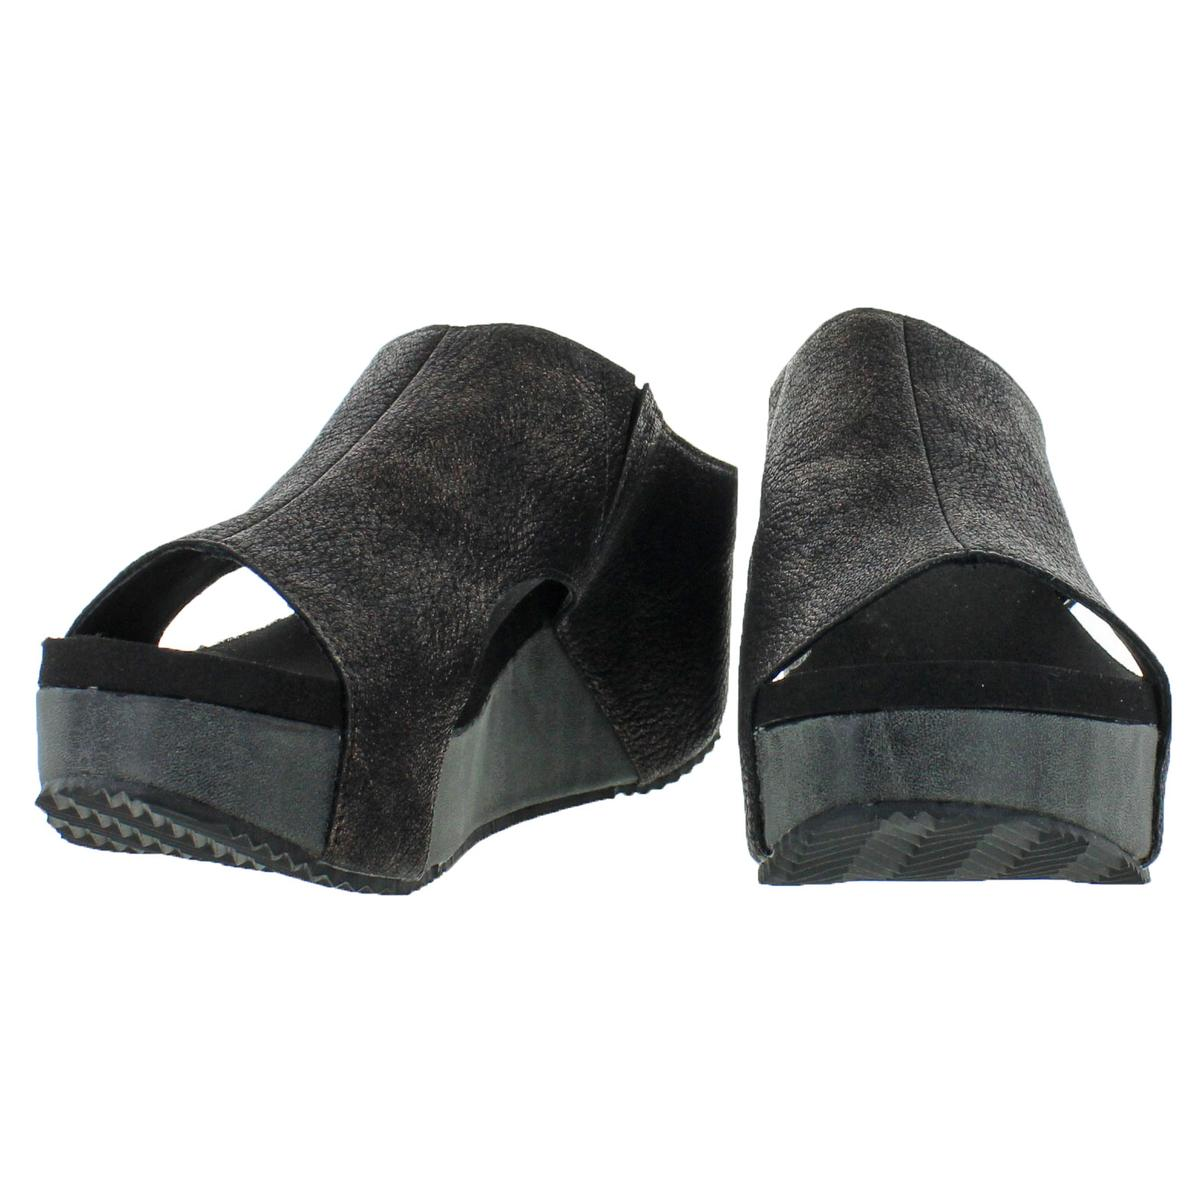 870468f3a69e VOLATILE Women s Bronx Wedge Sandal Bronze Size 8.0 for sale online ...